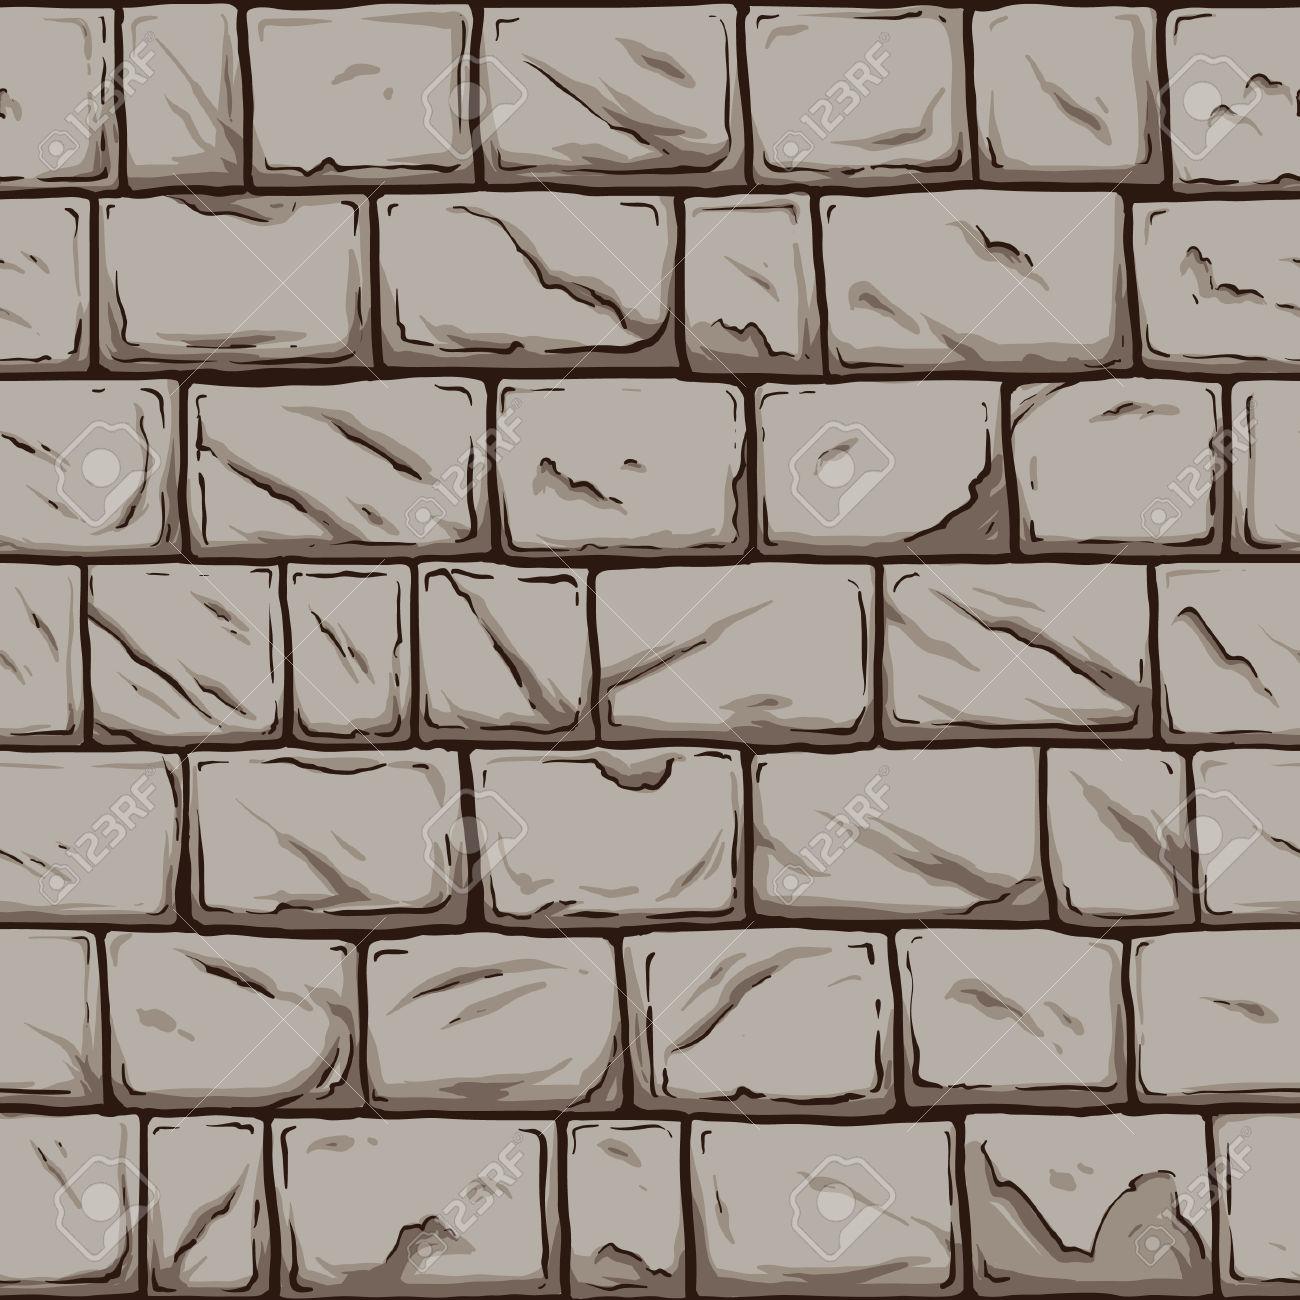 Stone wall clipart freeuse stock 18+ Stone Wall Clipart   ClipartLook freeuse stock